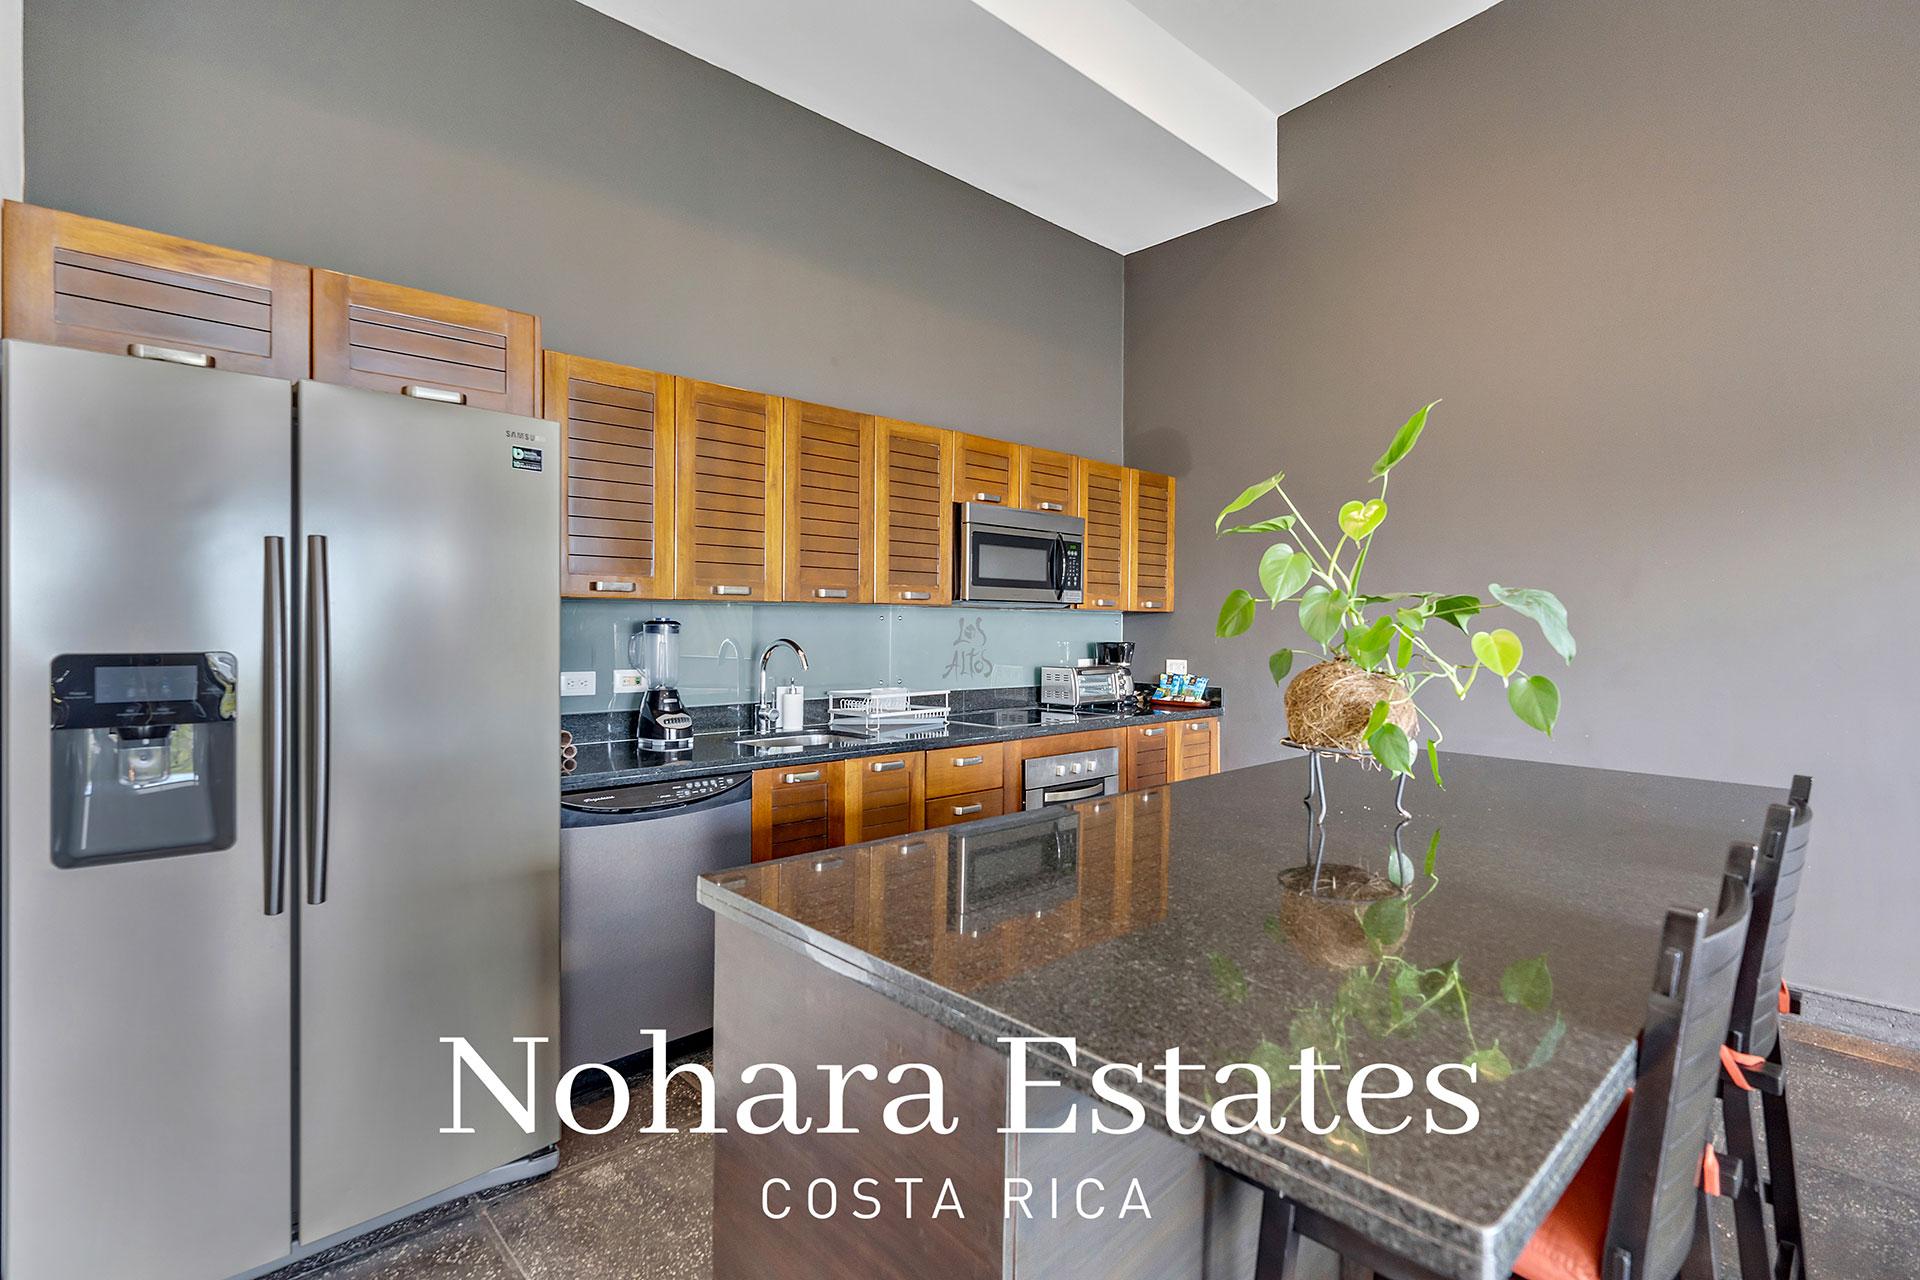 Nohara Estates Costa Rica 122 Apartment Quepos Los Altos 9